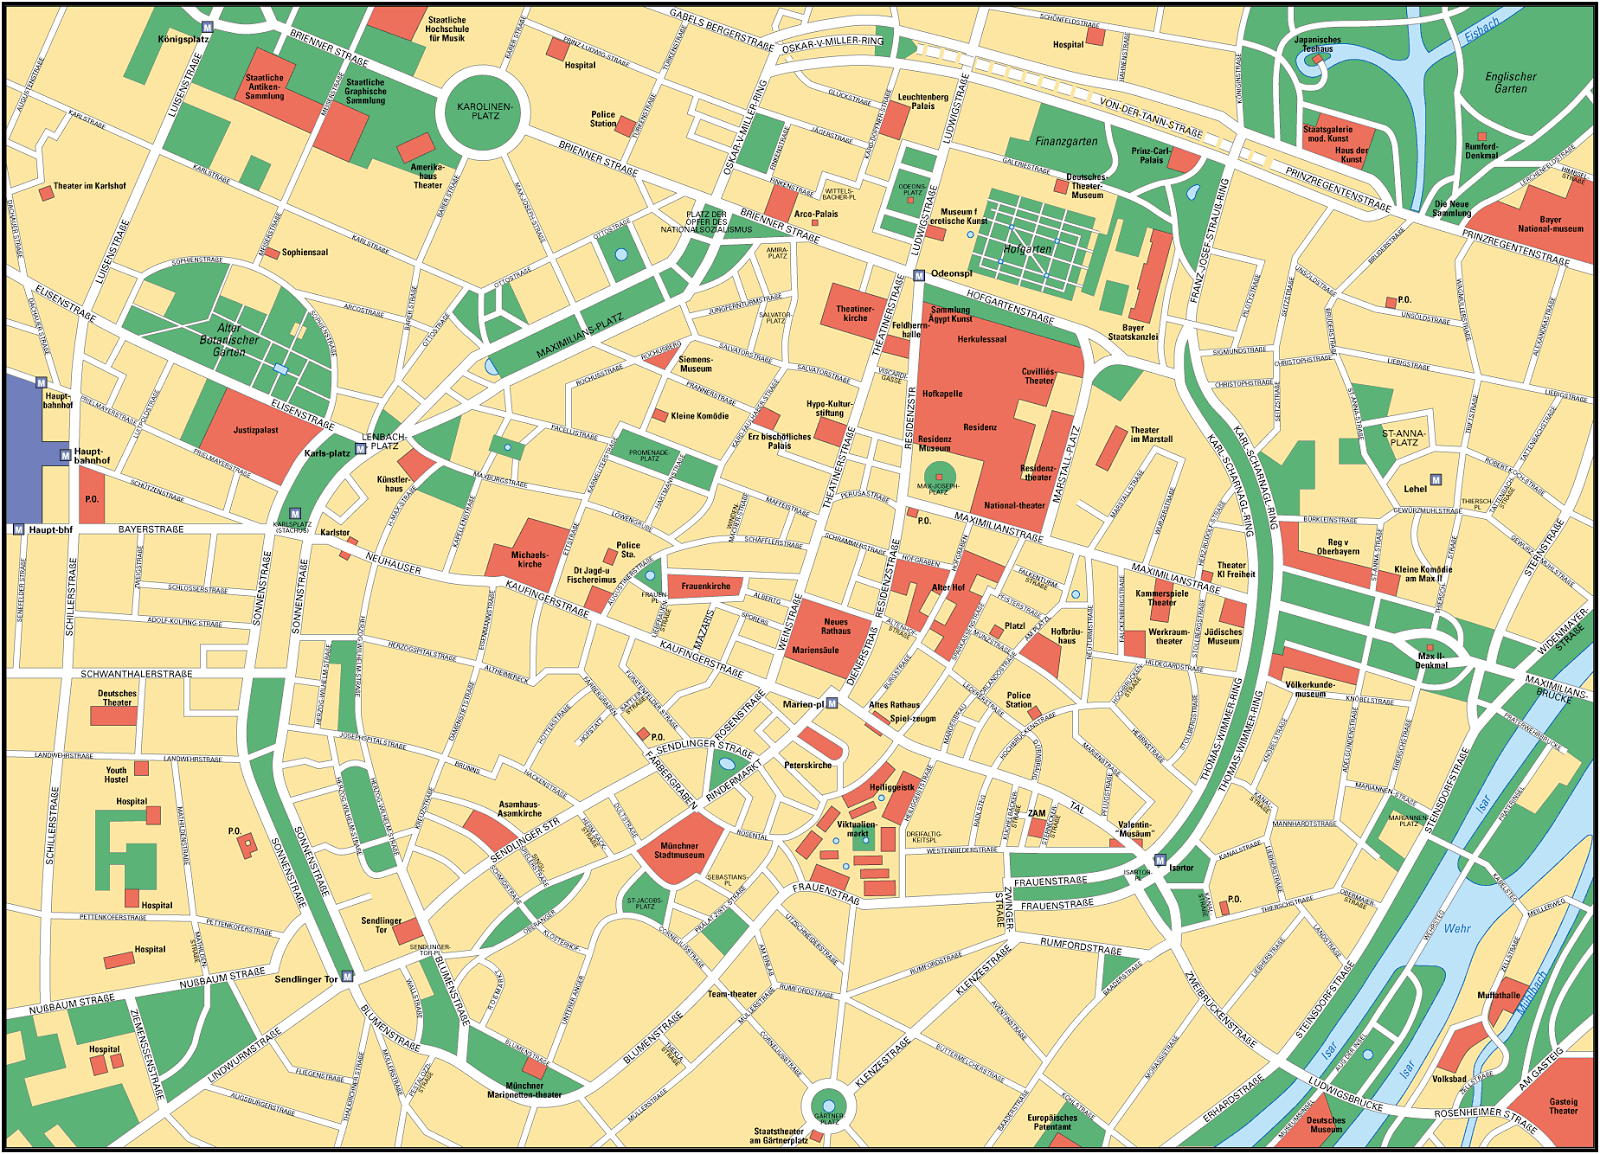 Mapa de Munich